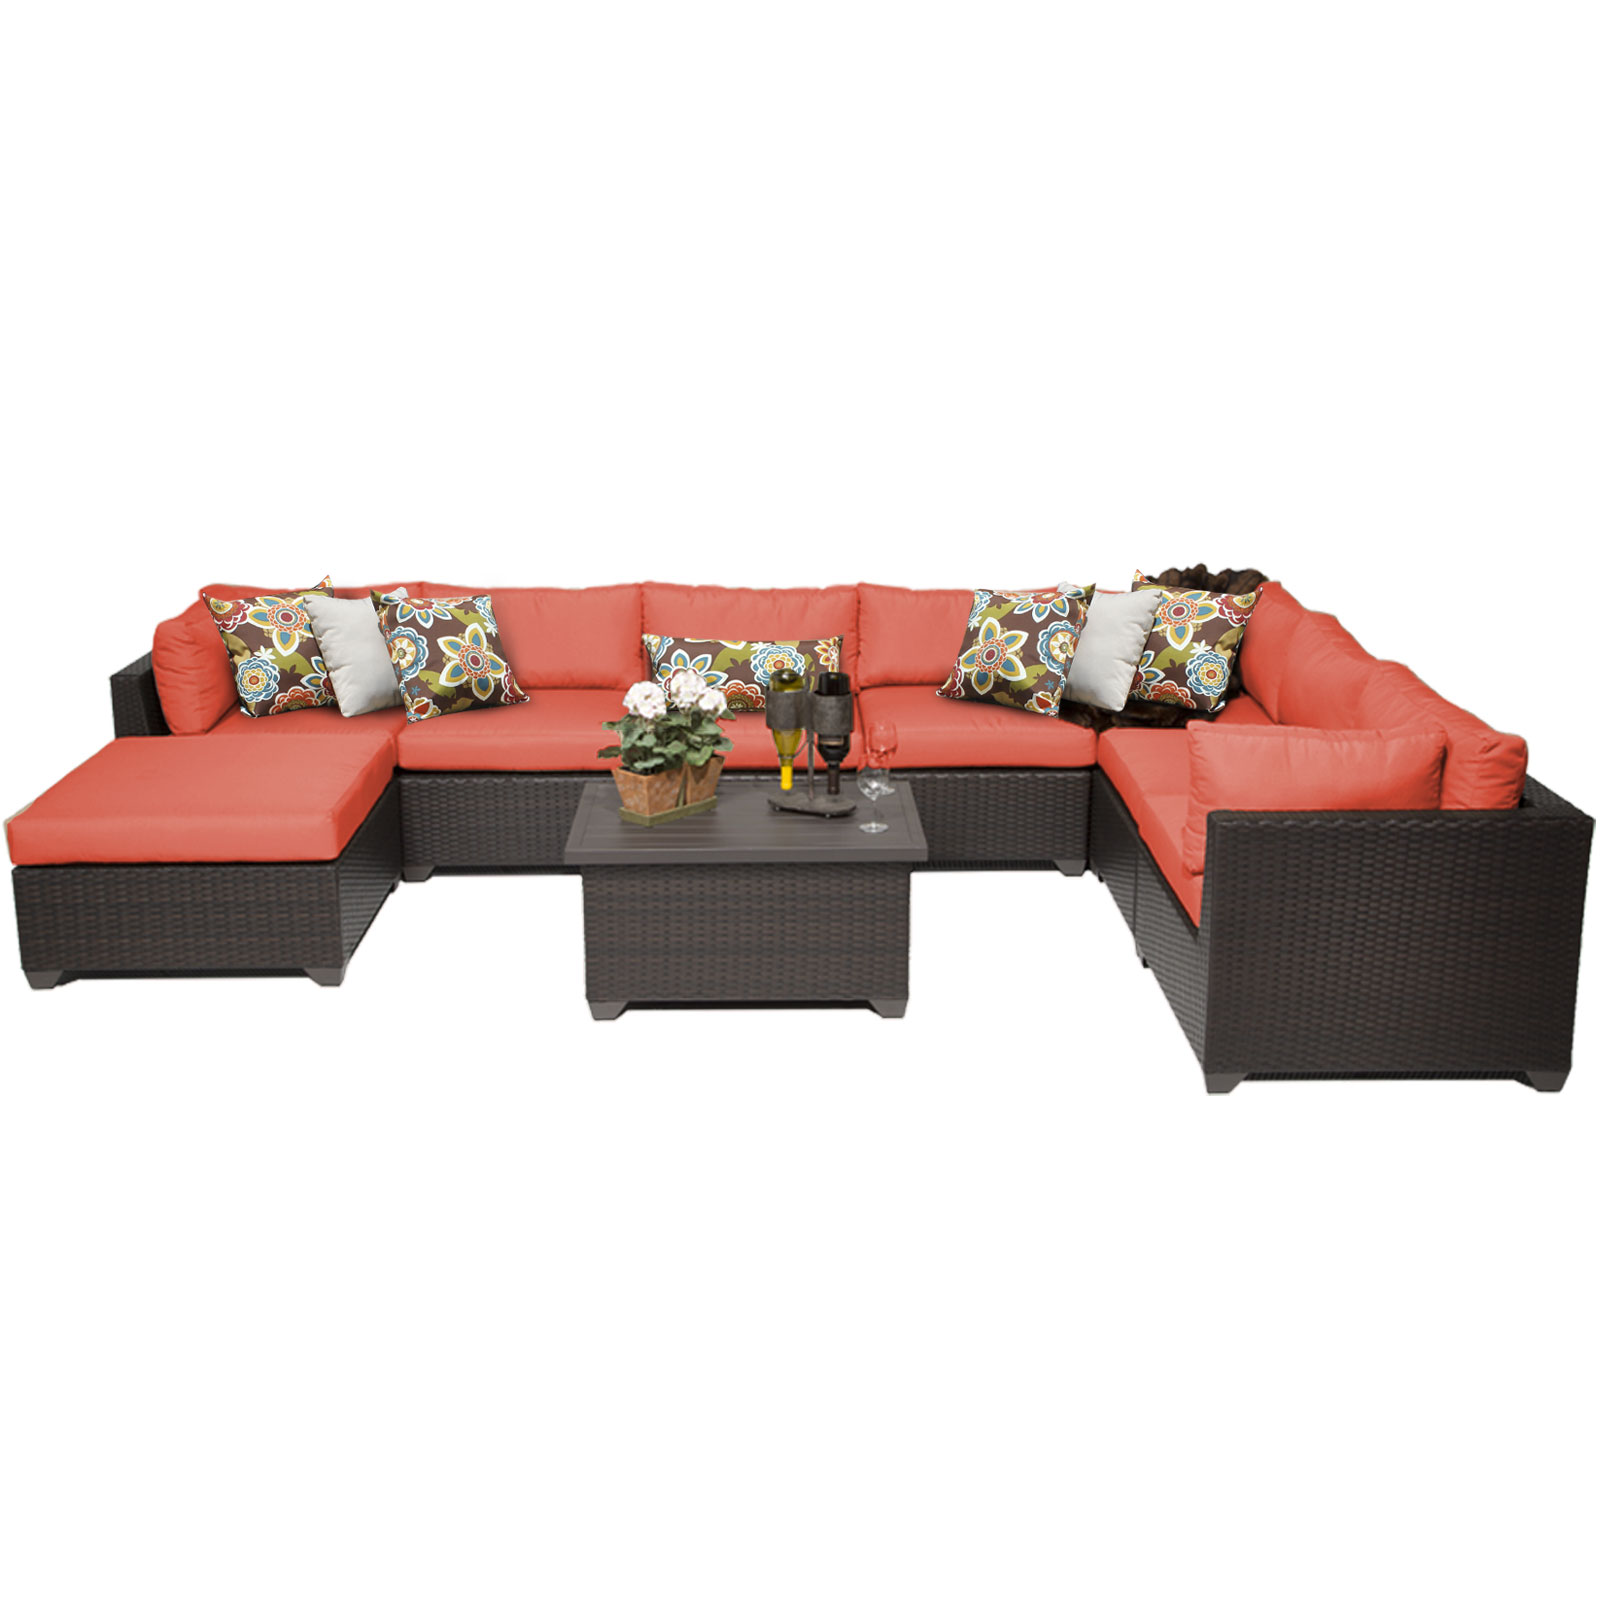 Premier 9 Piece Outdoor Wicker Patio Furniture Set 09b